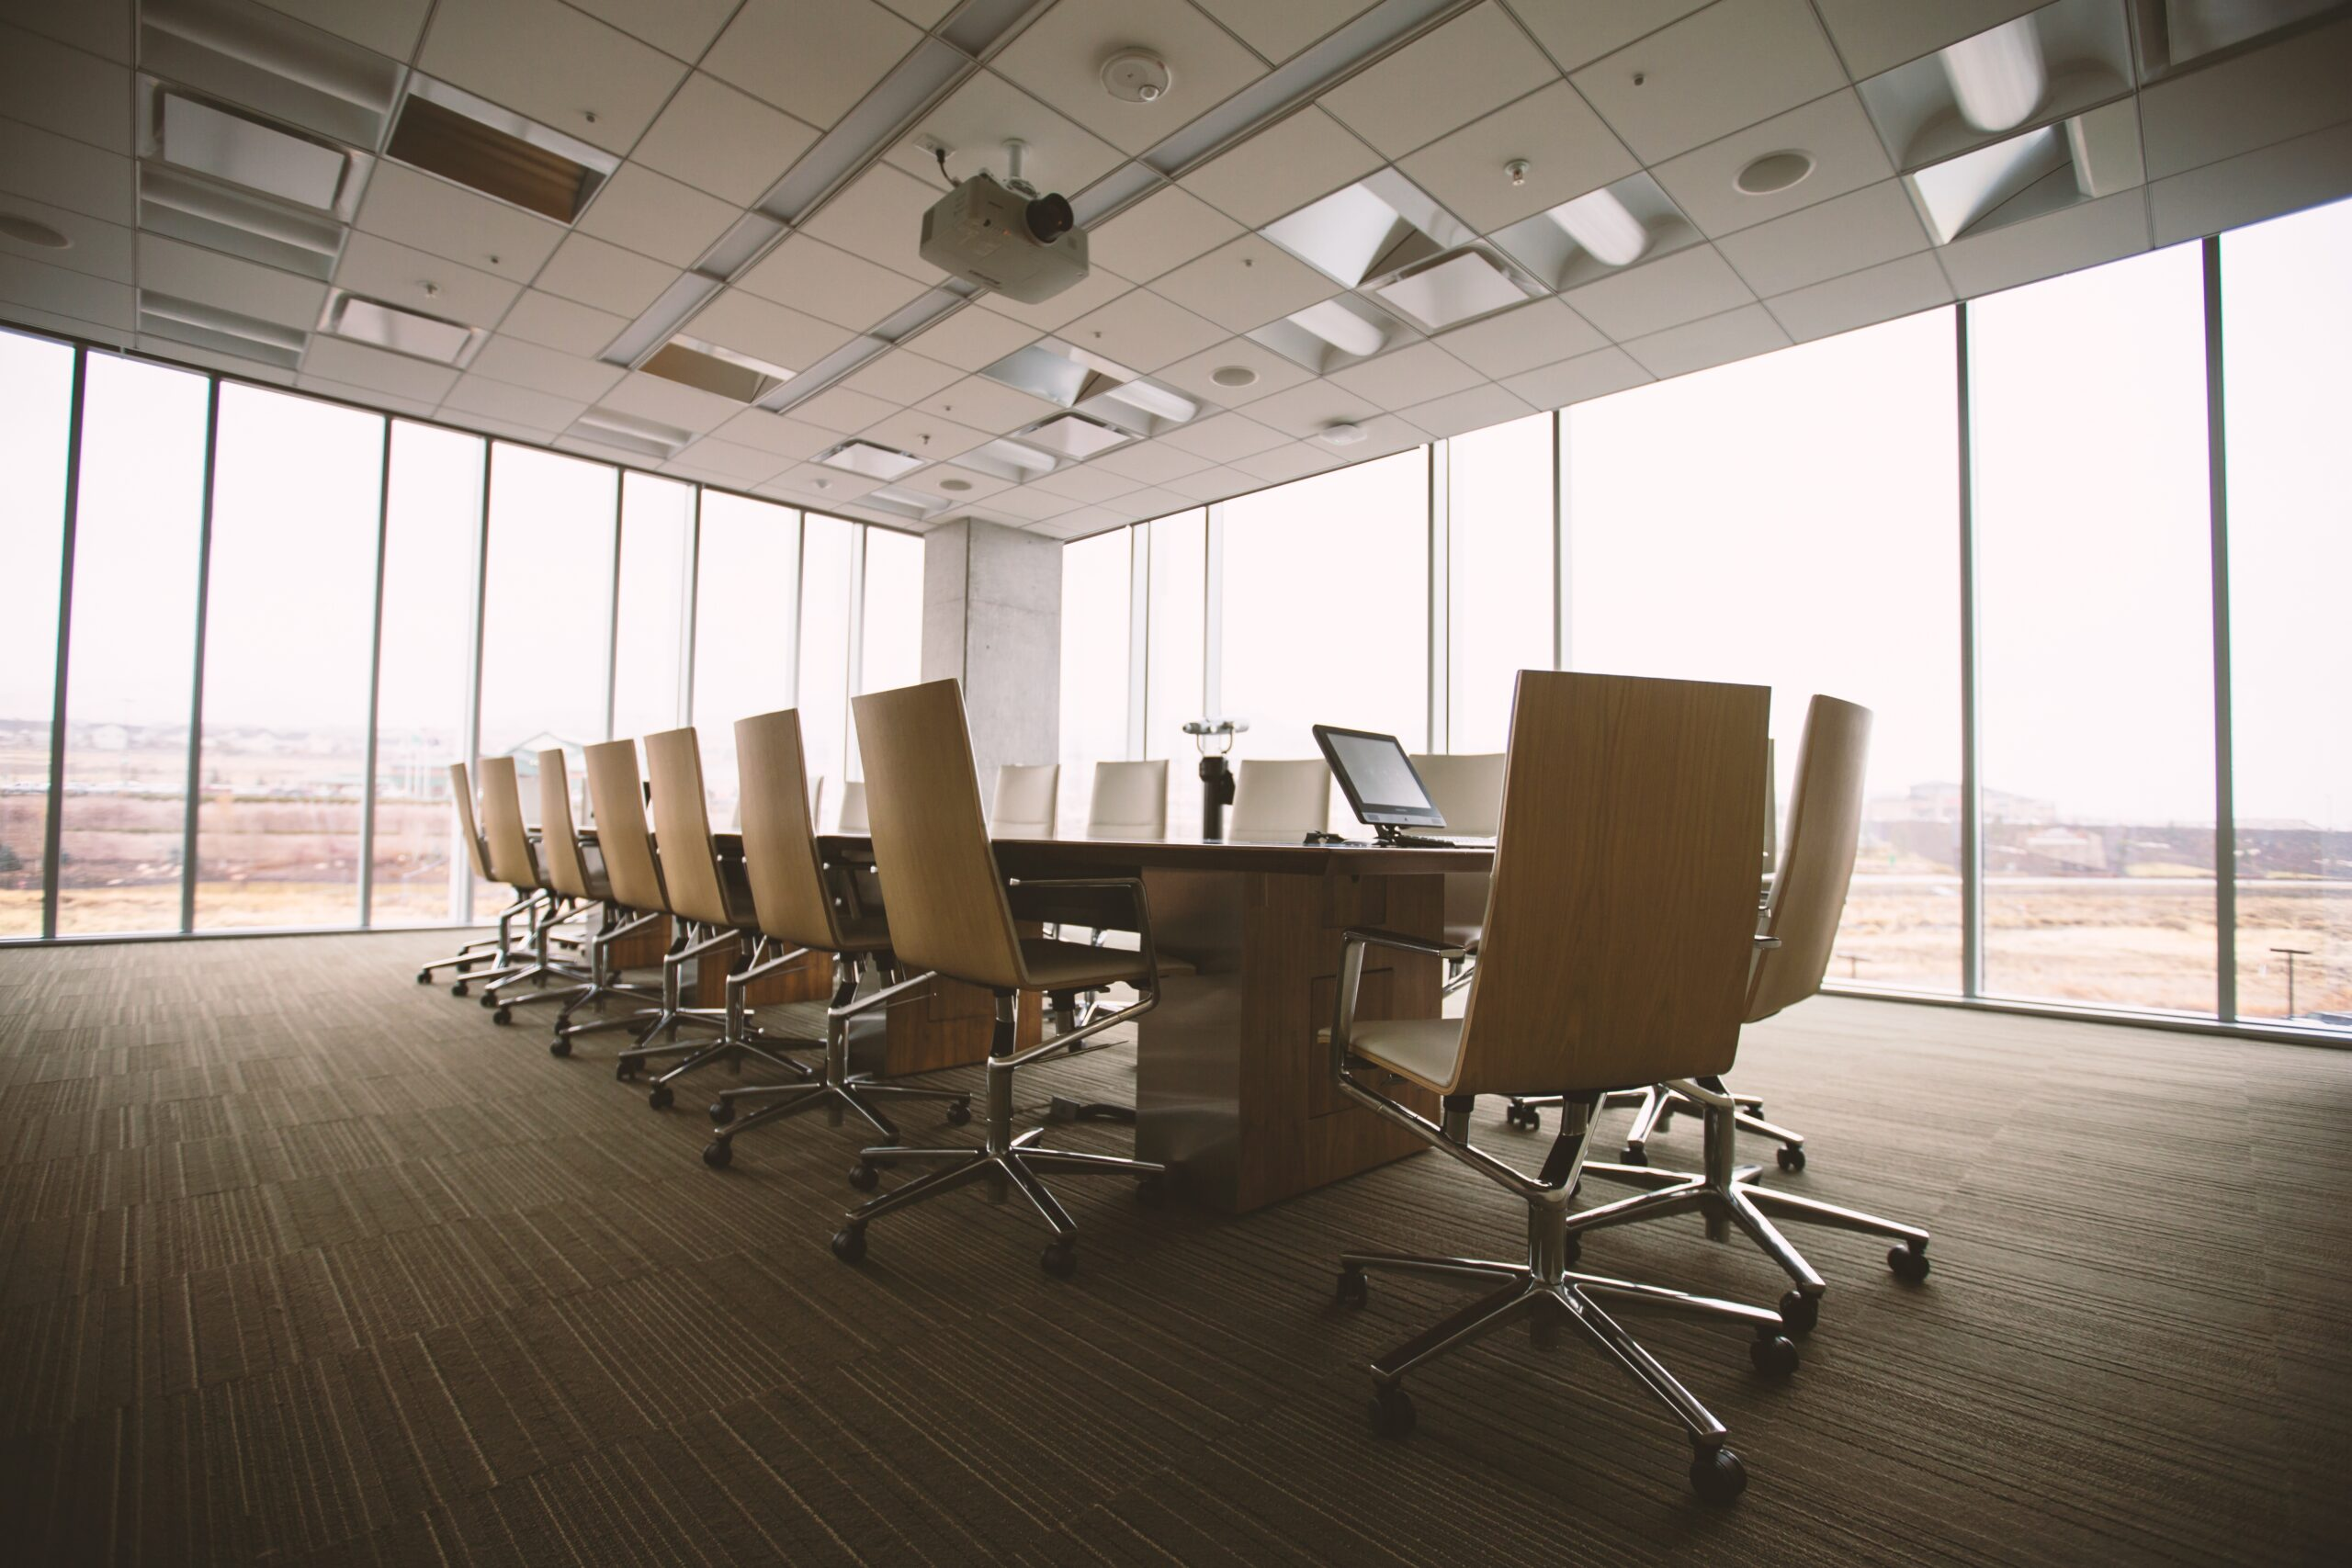 4 Productive Meeting Facilities Habits